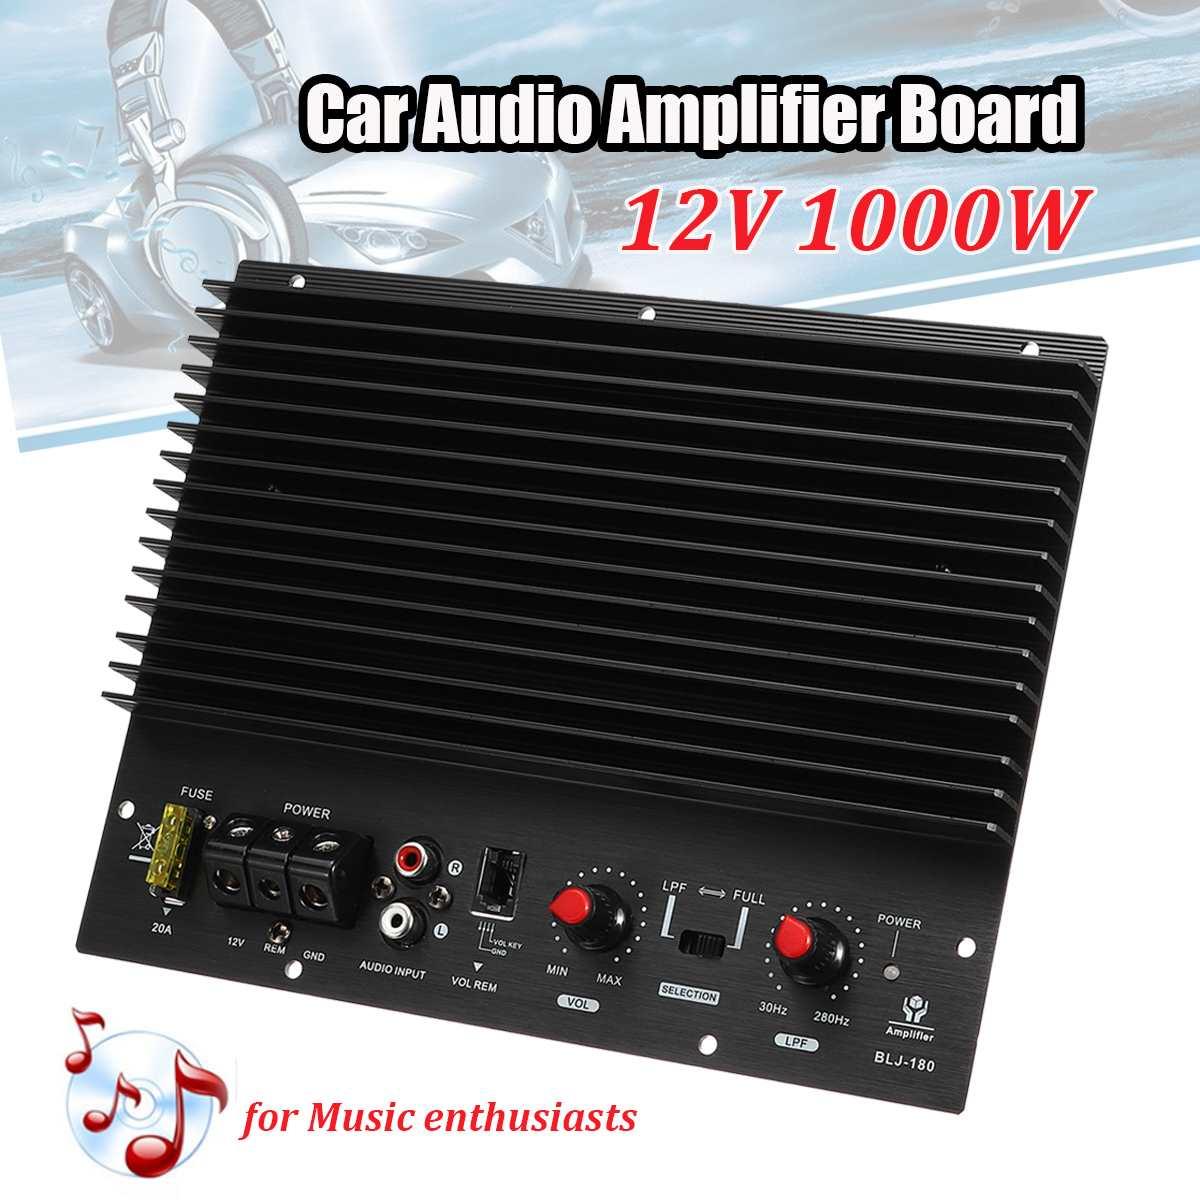 12V 1000W Car Amplifier Board Multichannel Audio Amplifier Subwoofer Powerful Bass DIY Amp Board Auto Car Music Player